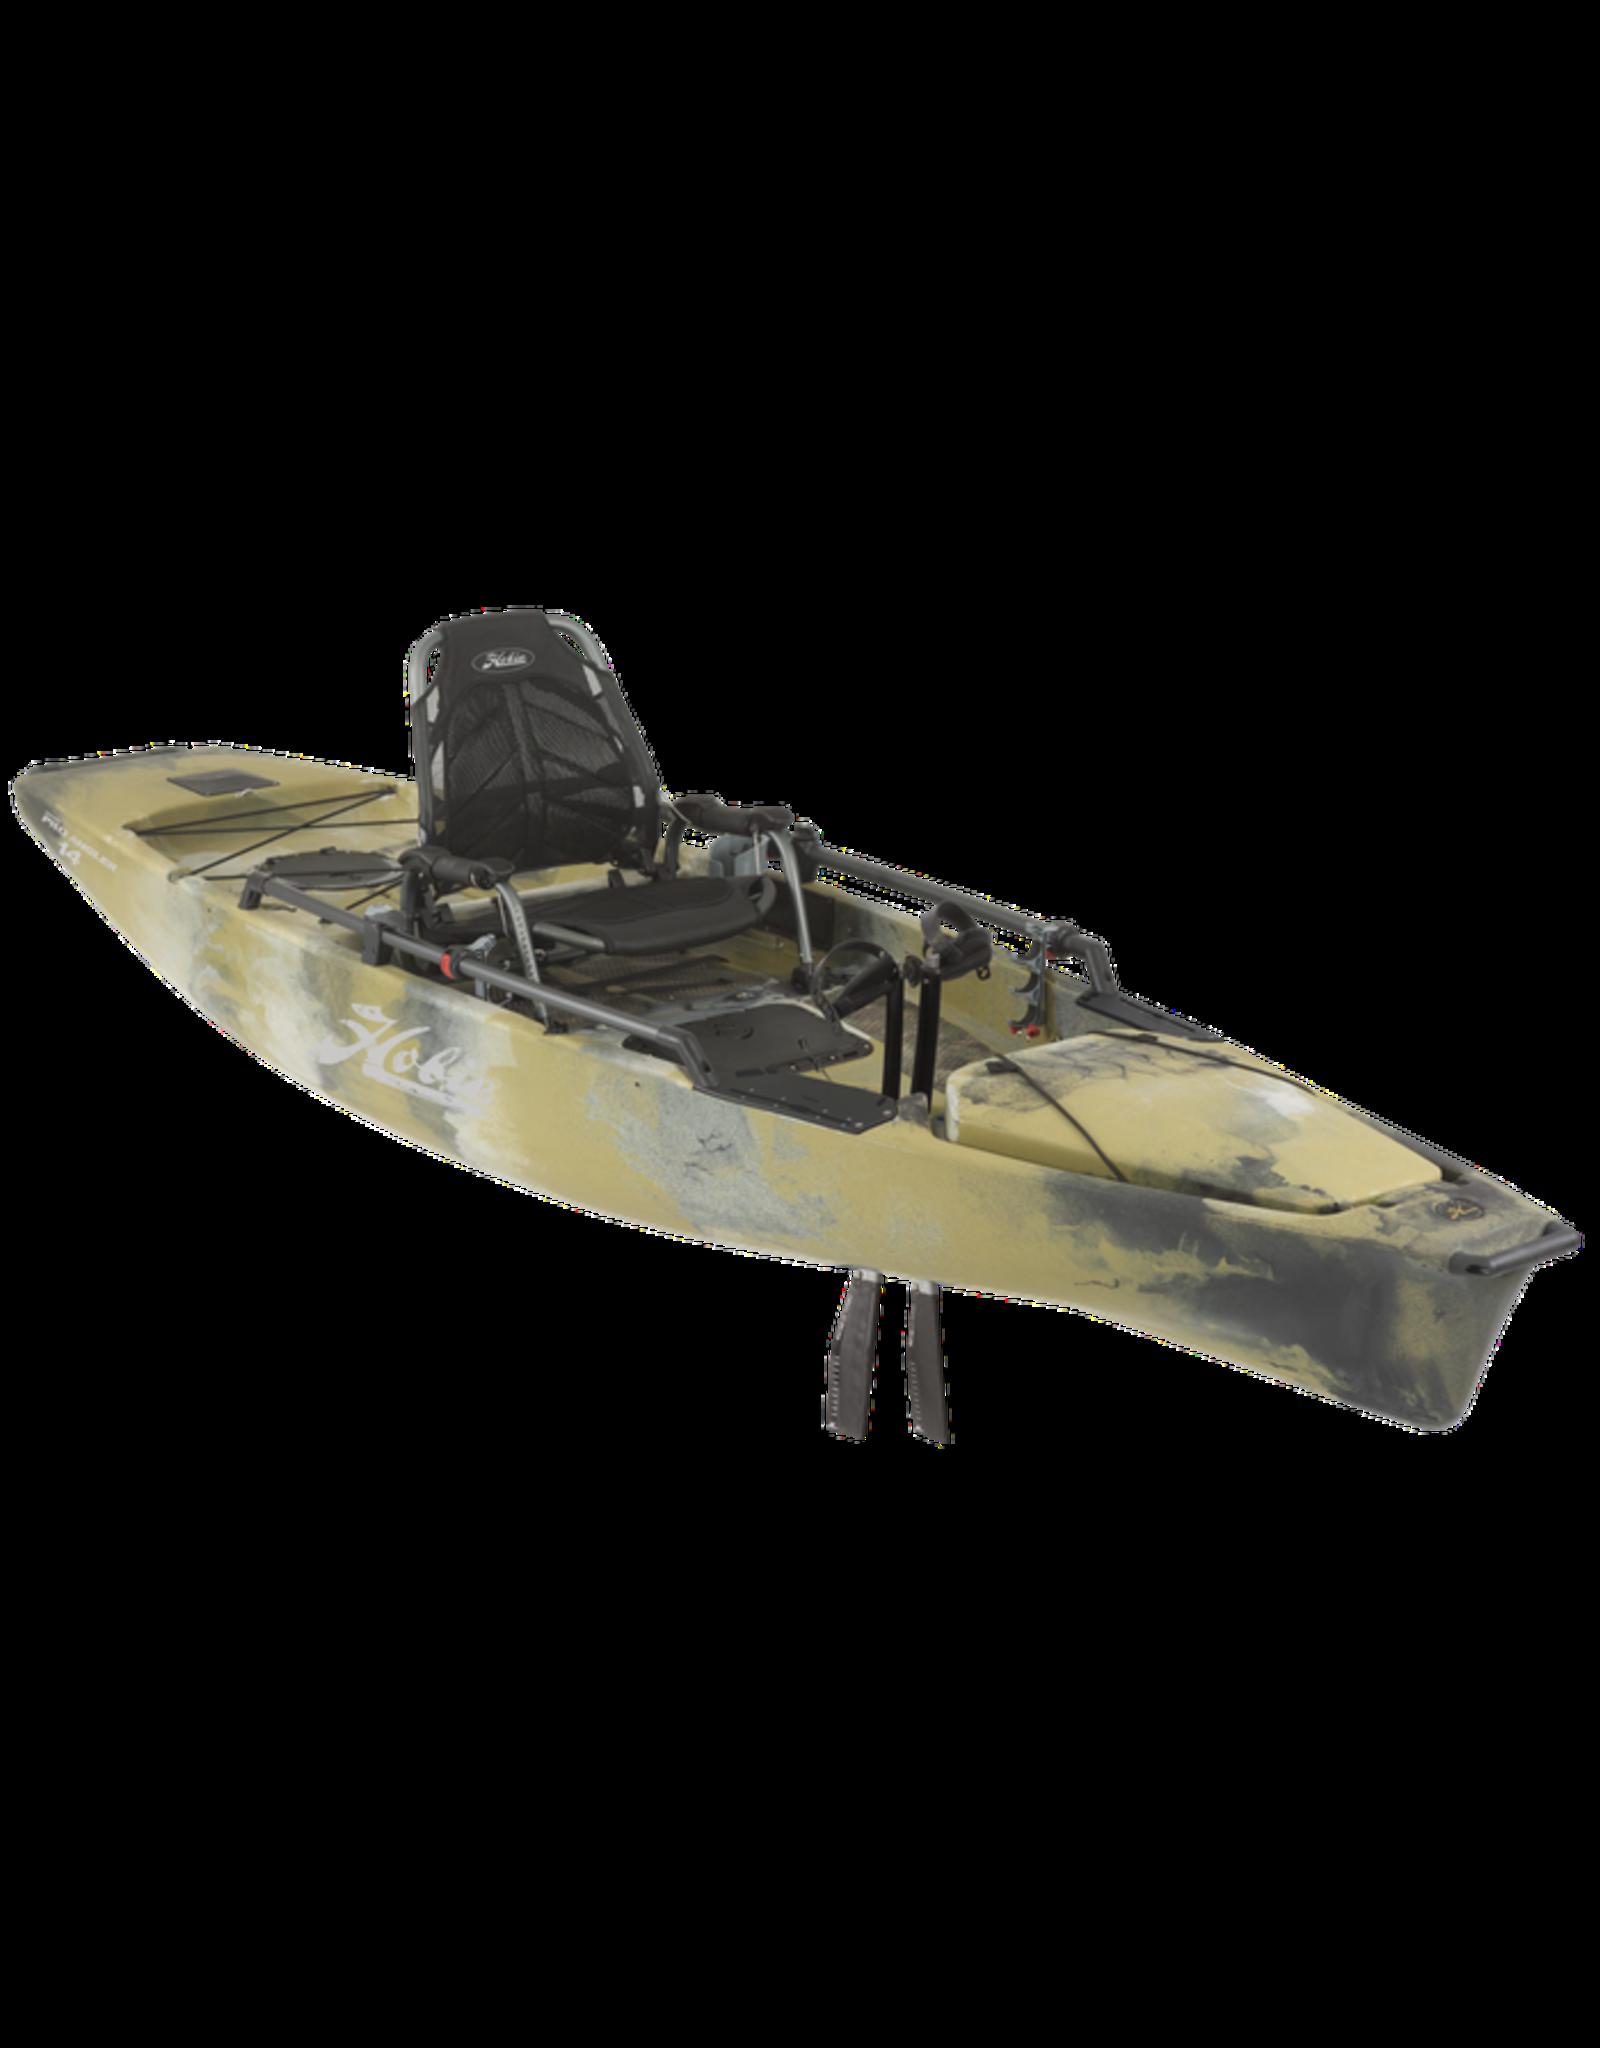 Hobie Hobie kayak Pro Angler 14 MD 180 TURBO Kick-Up Fin Camo